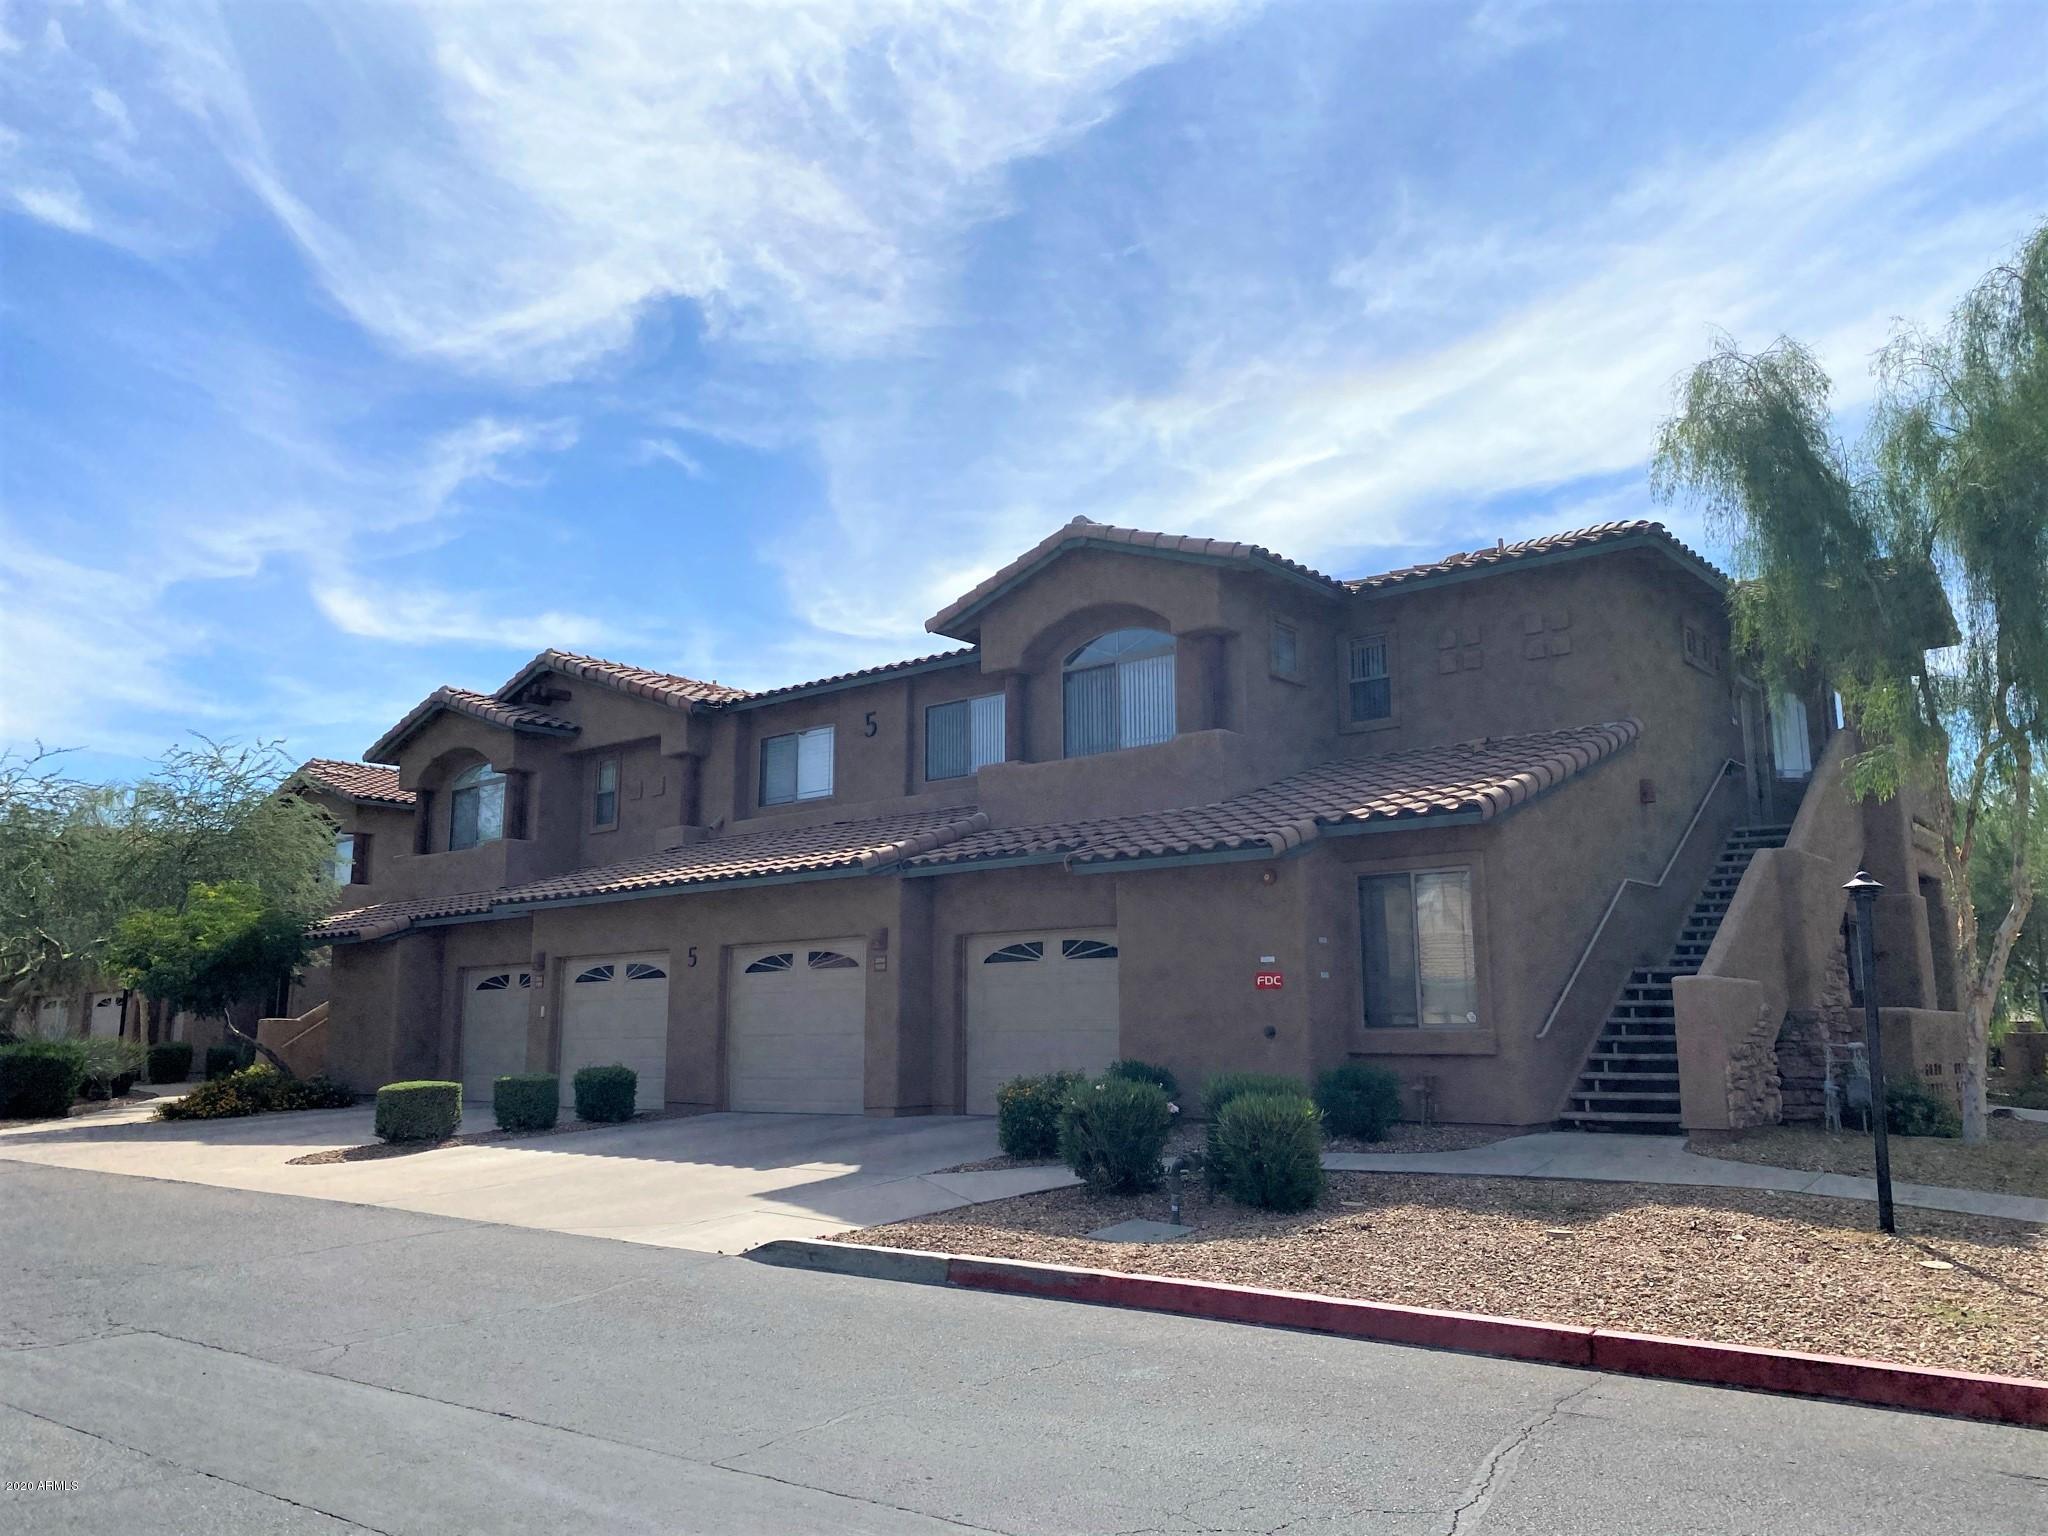 11500 E COCHISE Drive # 1010, Scottsdale, AZ 85259, 2 Bedrooms Bedrooms, ,Residential Lease,For Rent,11500 E COCHISE Drive # 1010,6143911